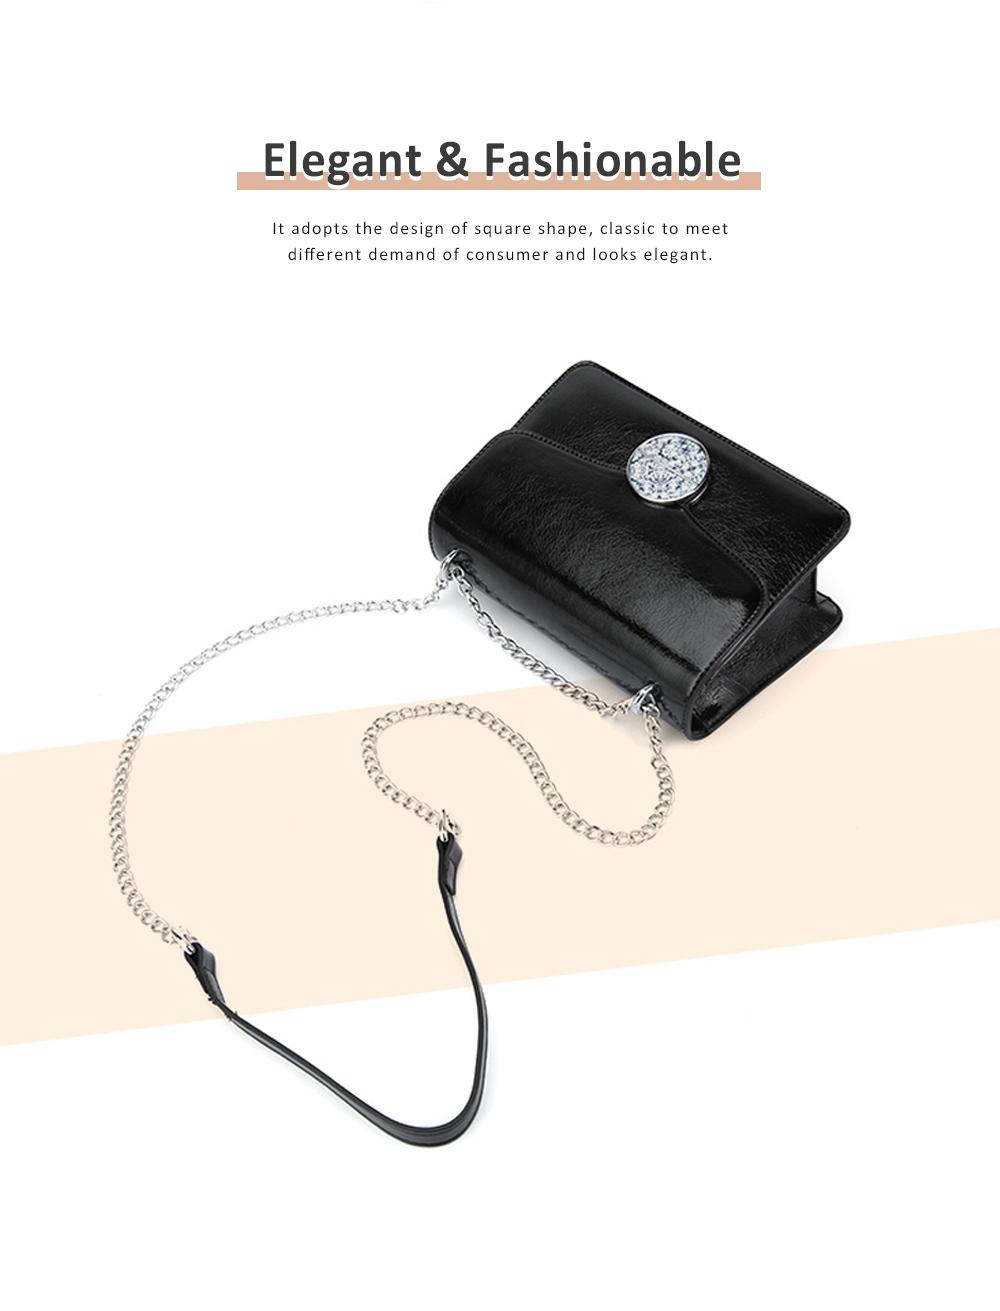 Marble Buckle Metal Chain Square Bag, High-quality PU Leather Handbag with Strap, Black Slanted Straddle Bag Single Shoulder Bag 1